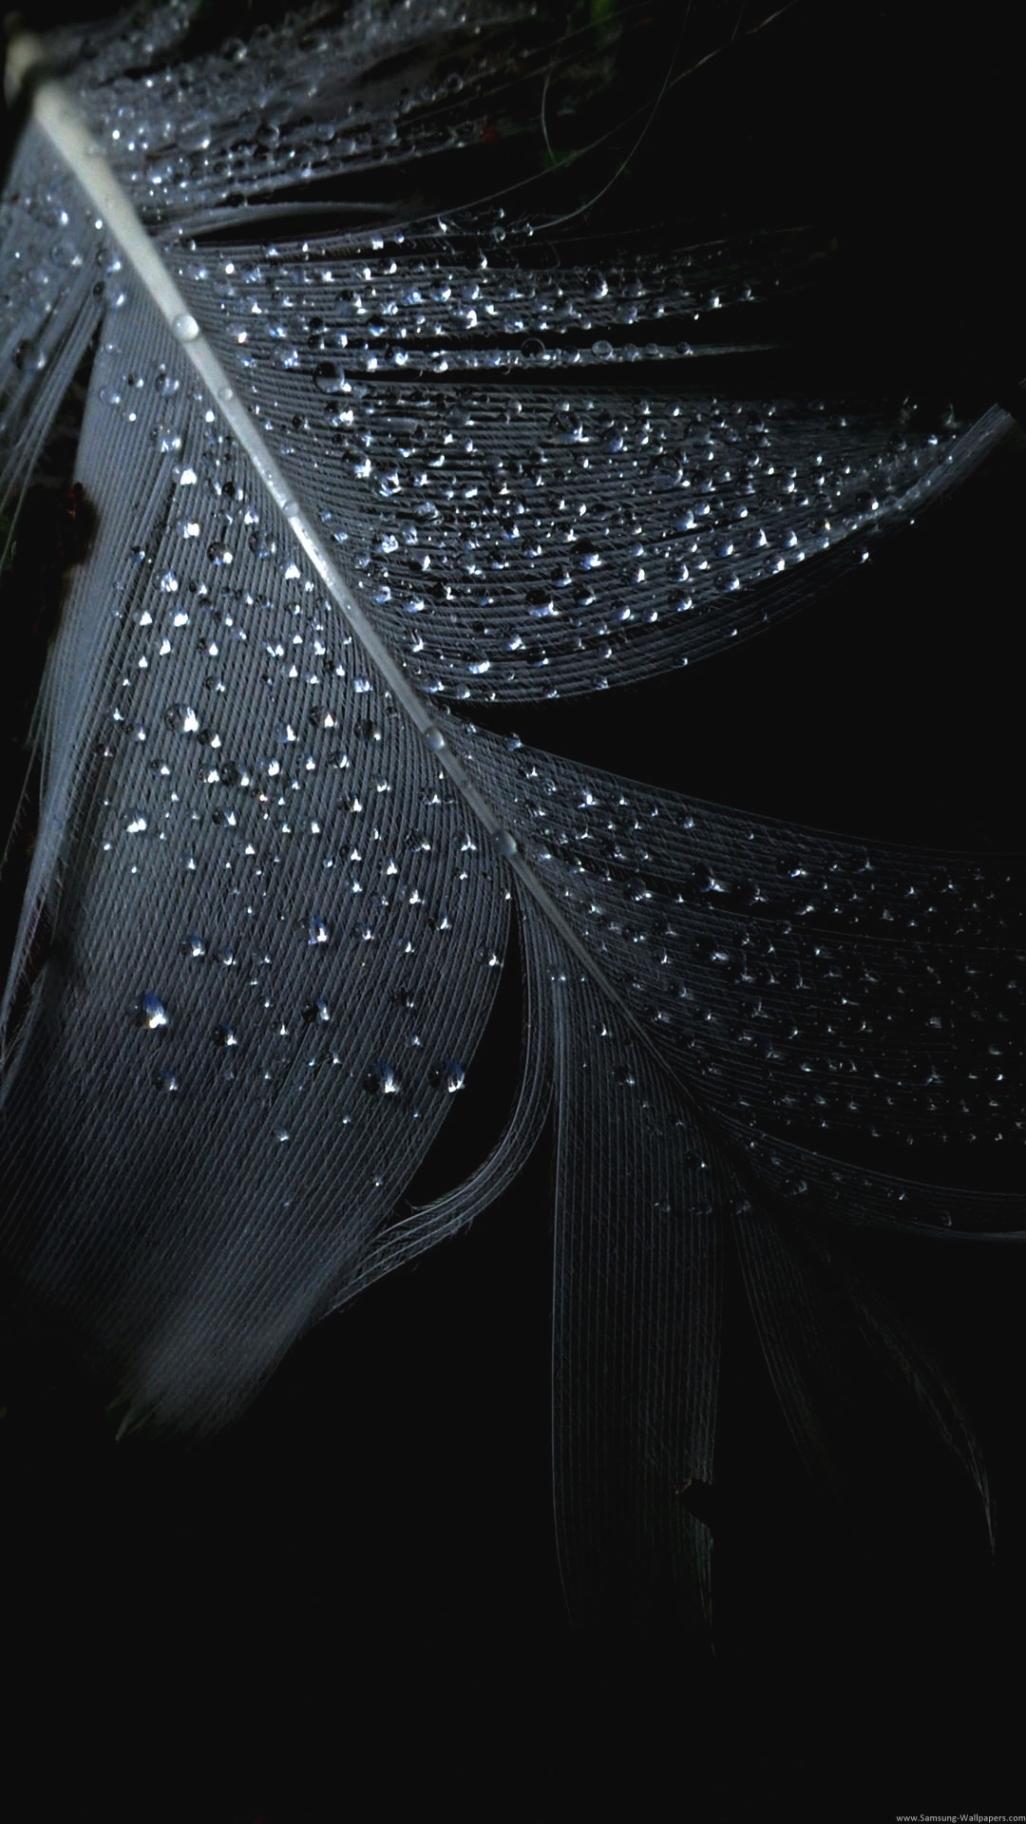 Iphone 6 Plus Wallpaper Dark Black Wallpaper Hd Download 1026x1824 Wallpaper Teahub Io